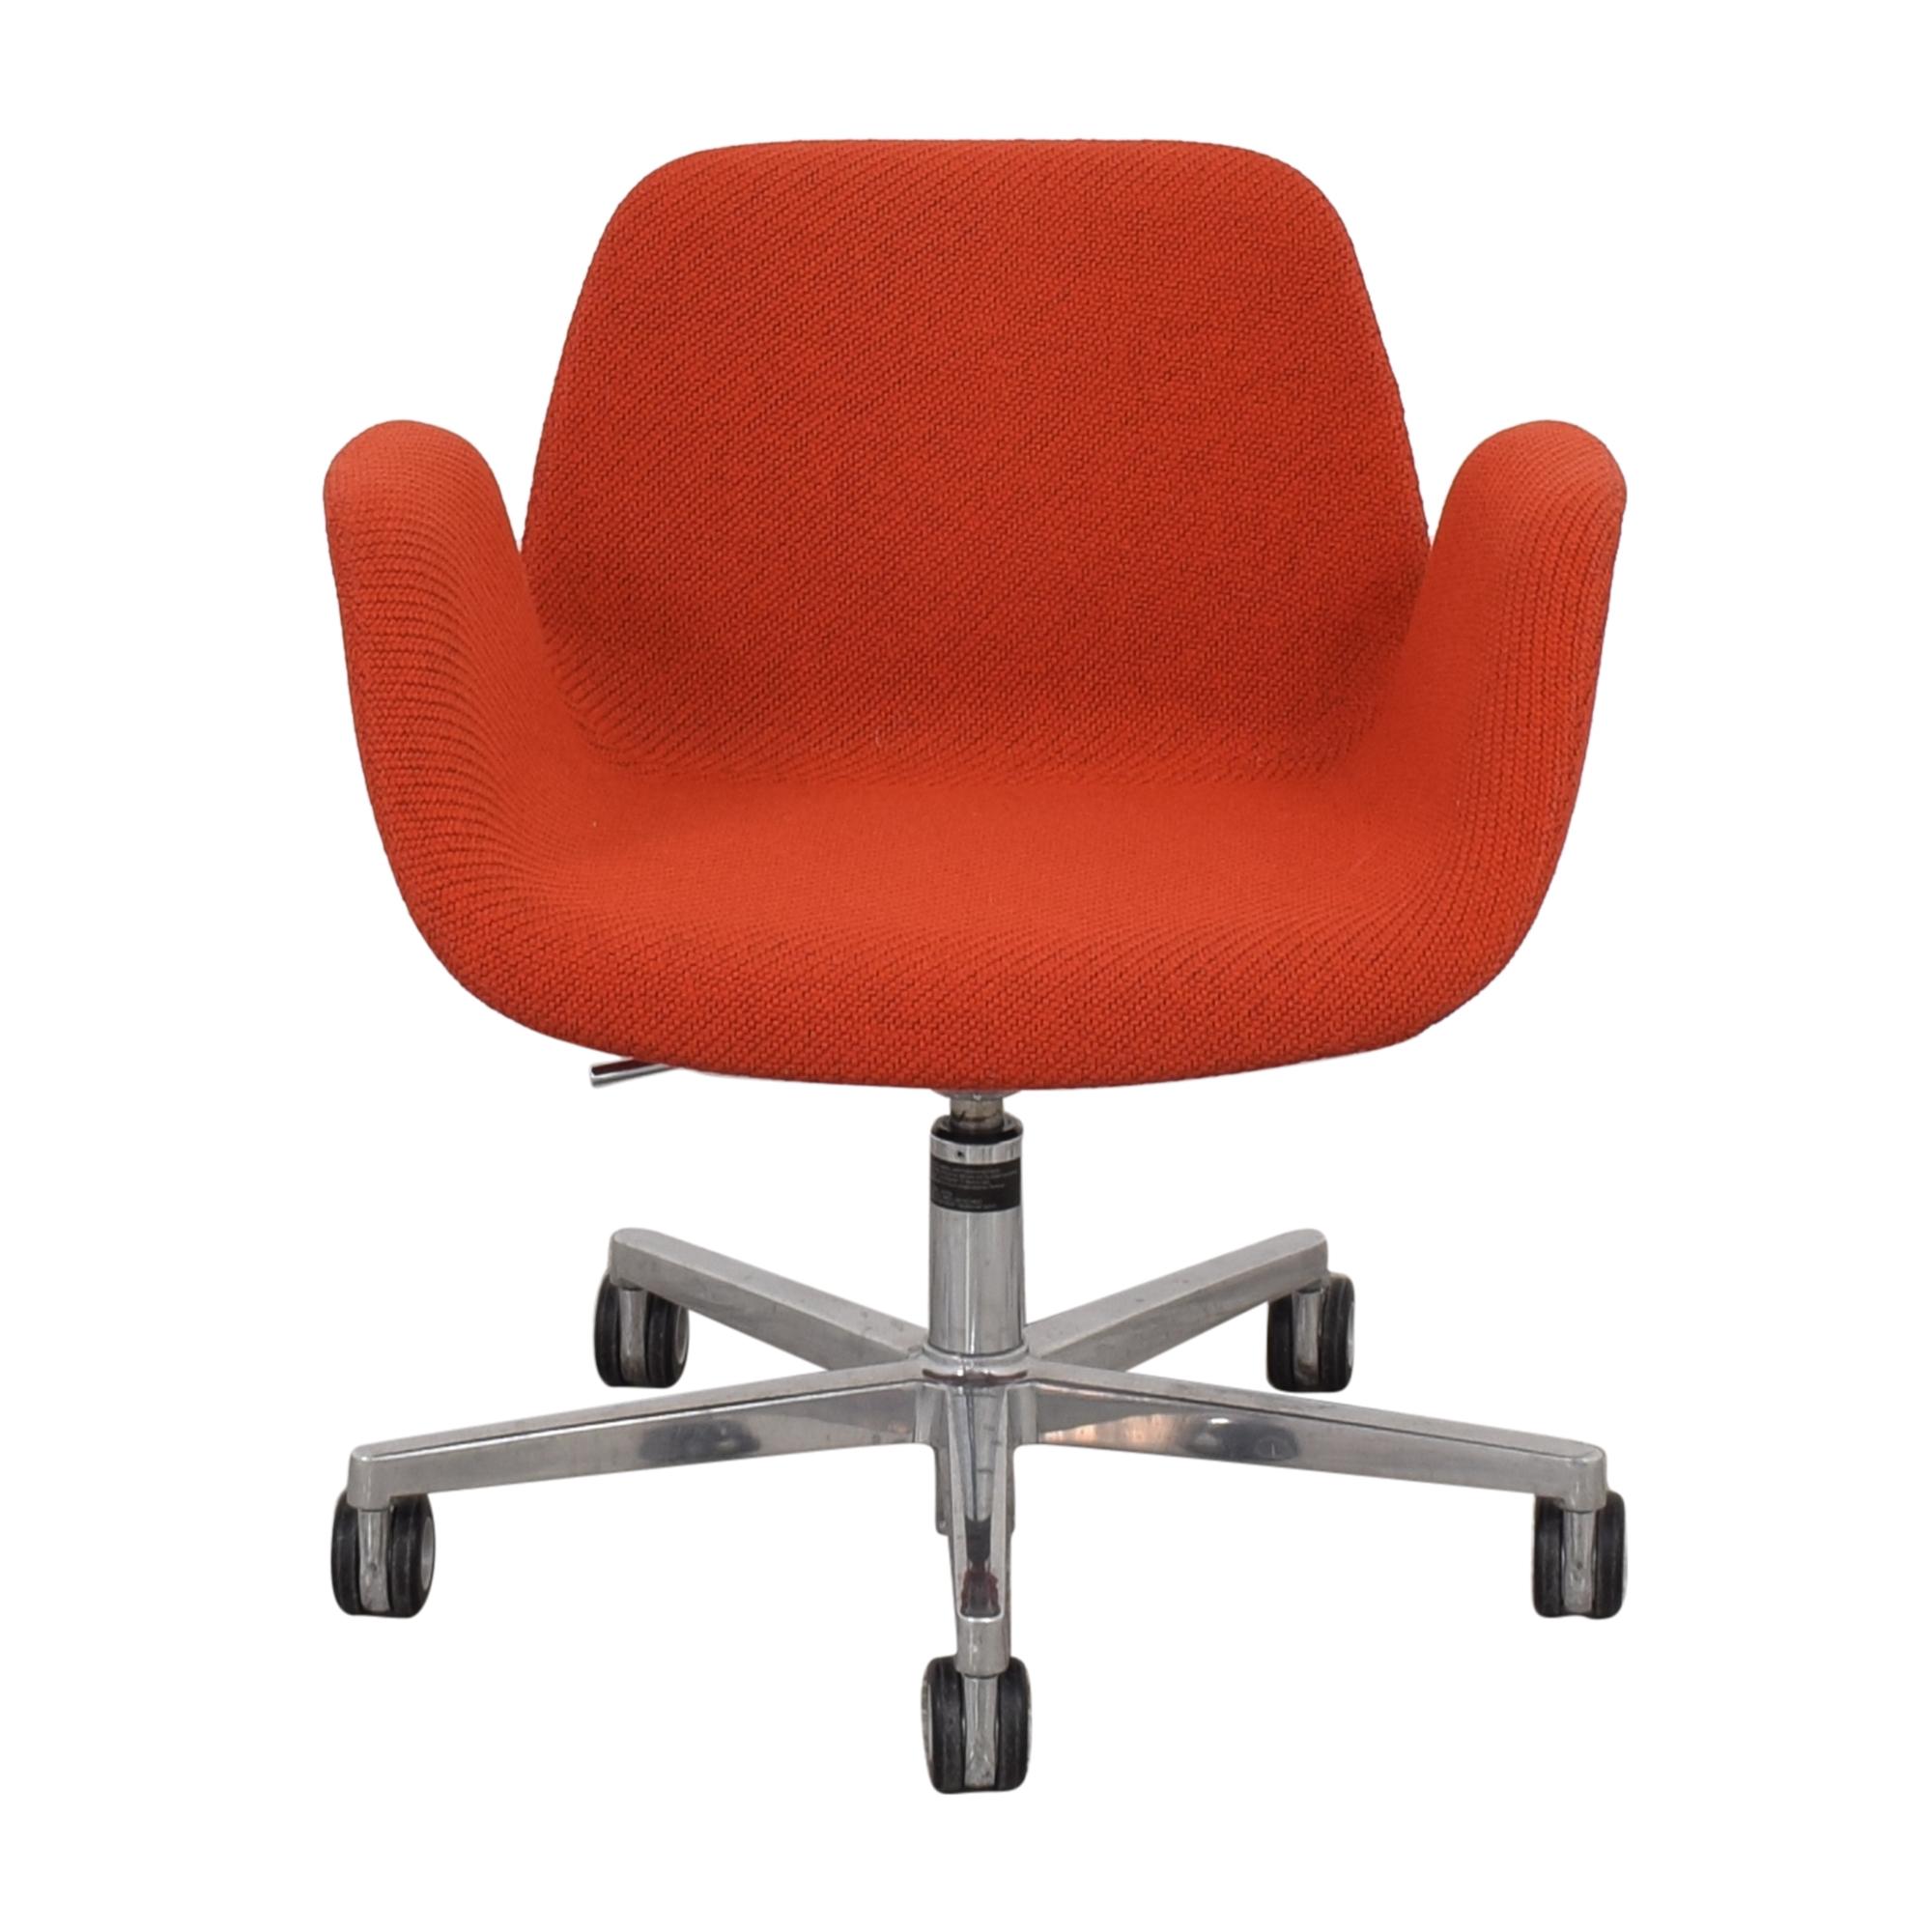 Koleksiyon Koleksiyon Halia Chair discount